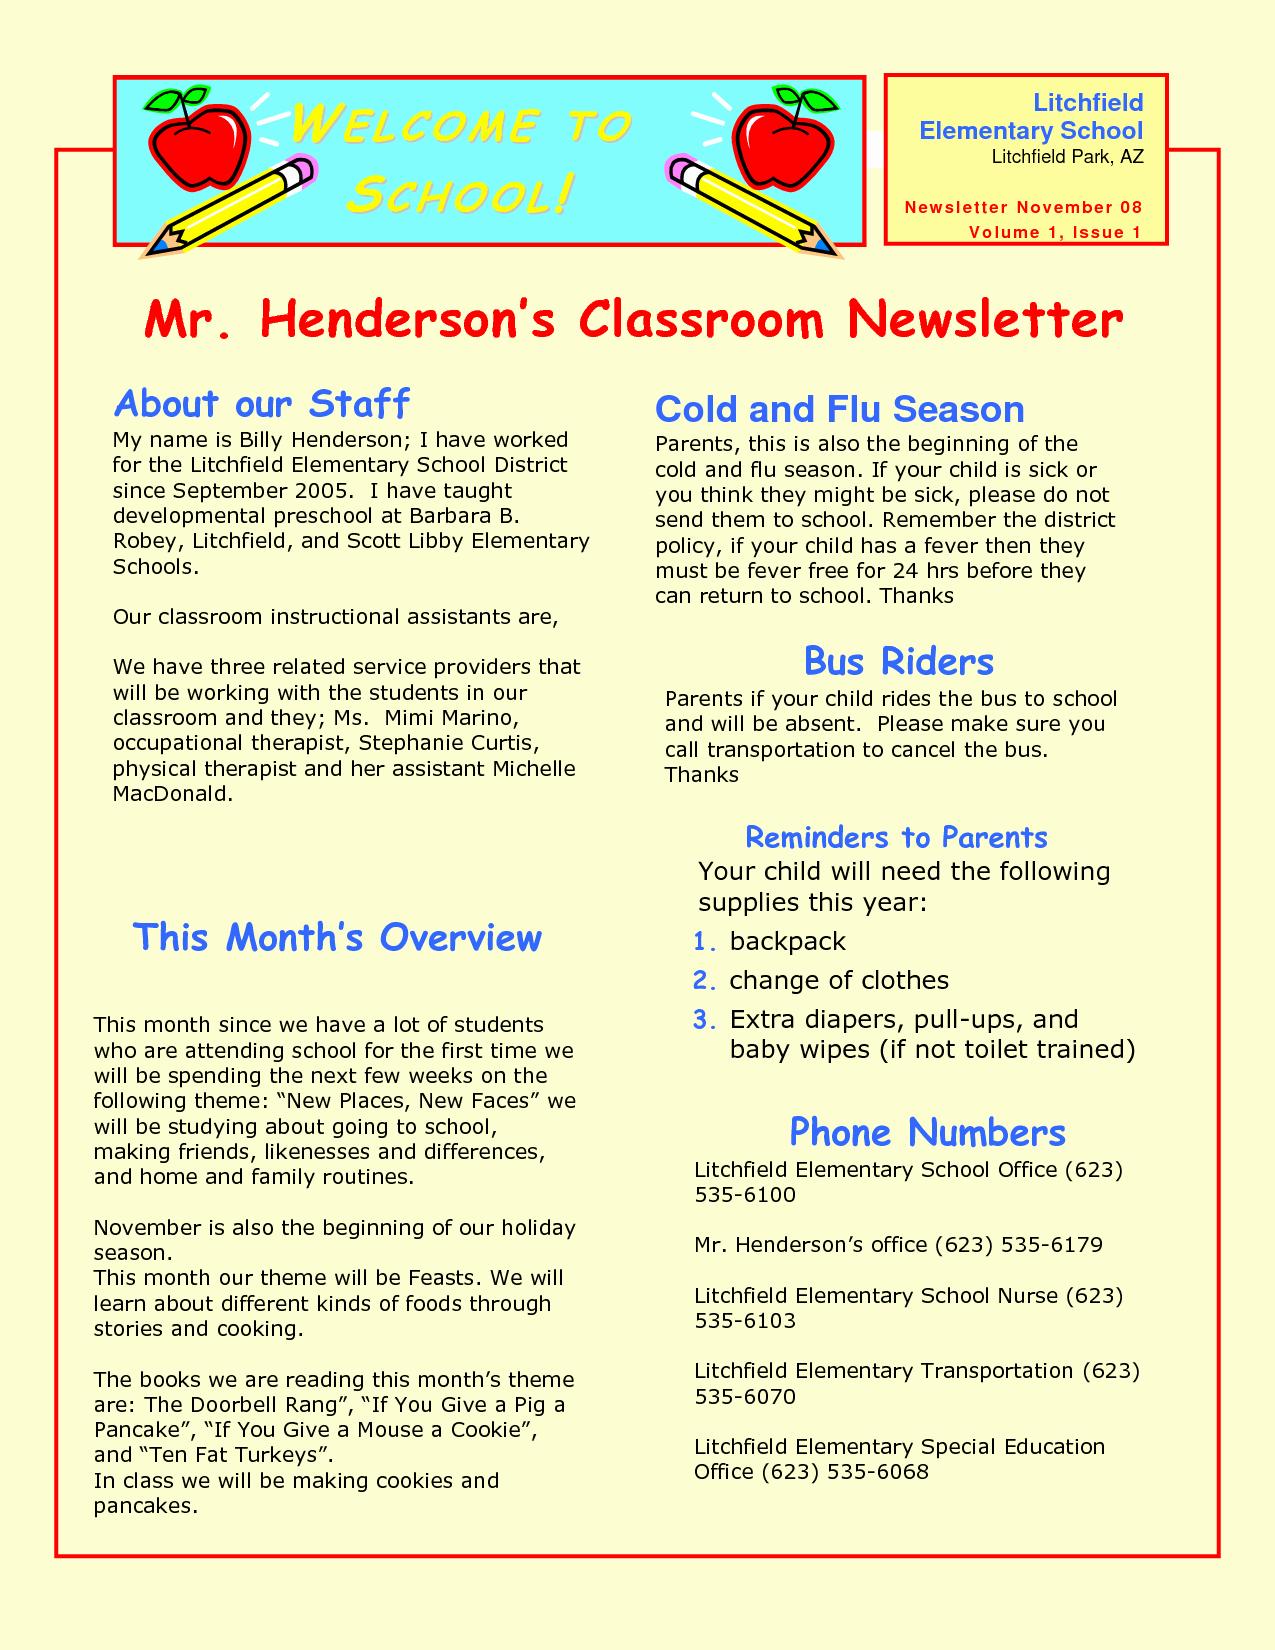 Newsletter Template for Preschool Beautiful Preschool Newsletter Samples